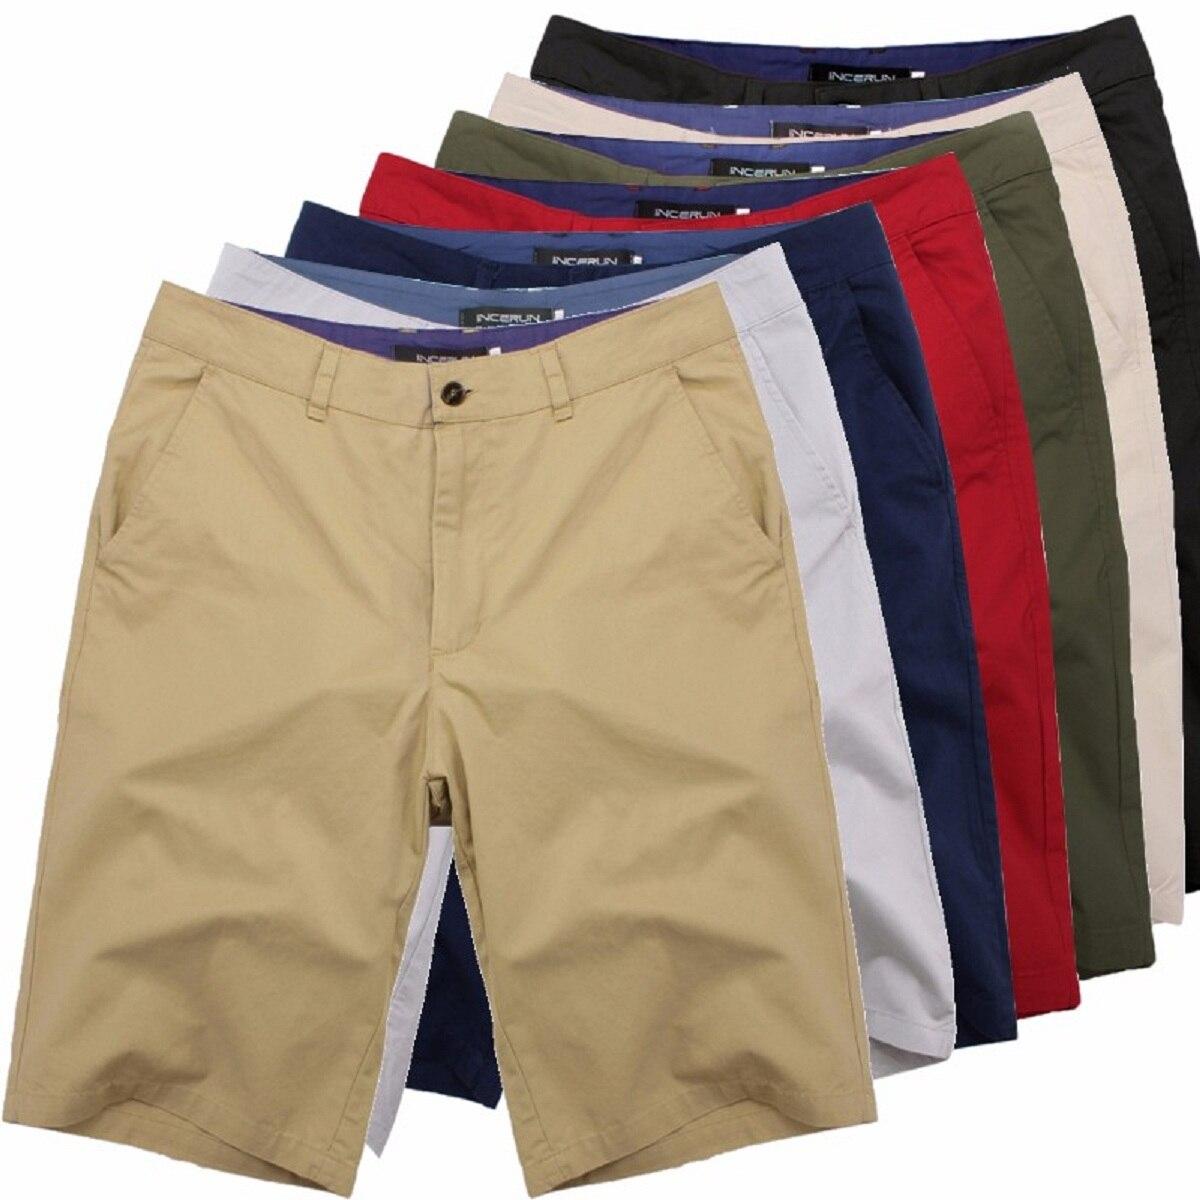 Hohe Qualität Sommer Smart Casual Shorts Männer Baumwolle Streetwear Fashion Plain Business Formale chinos Shorts Plus Größe 44 Mode